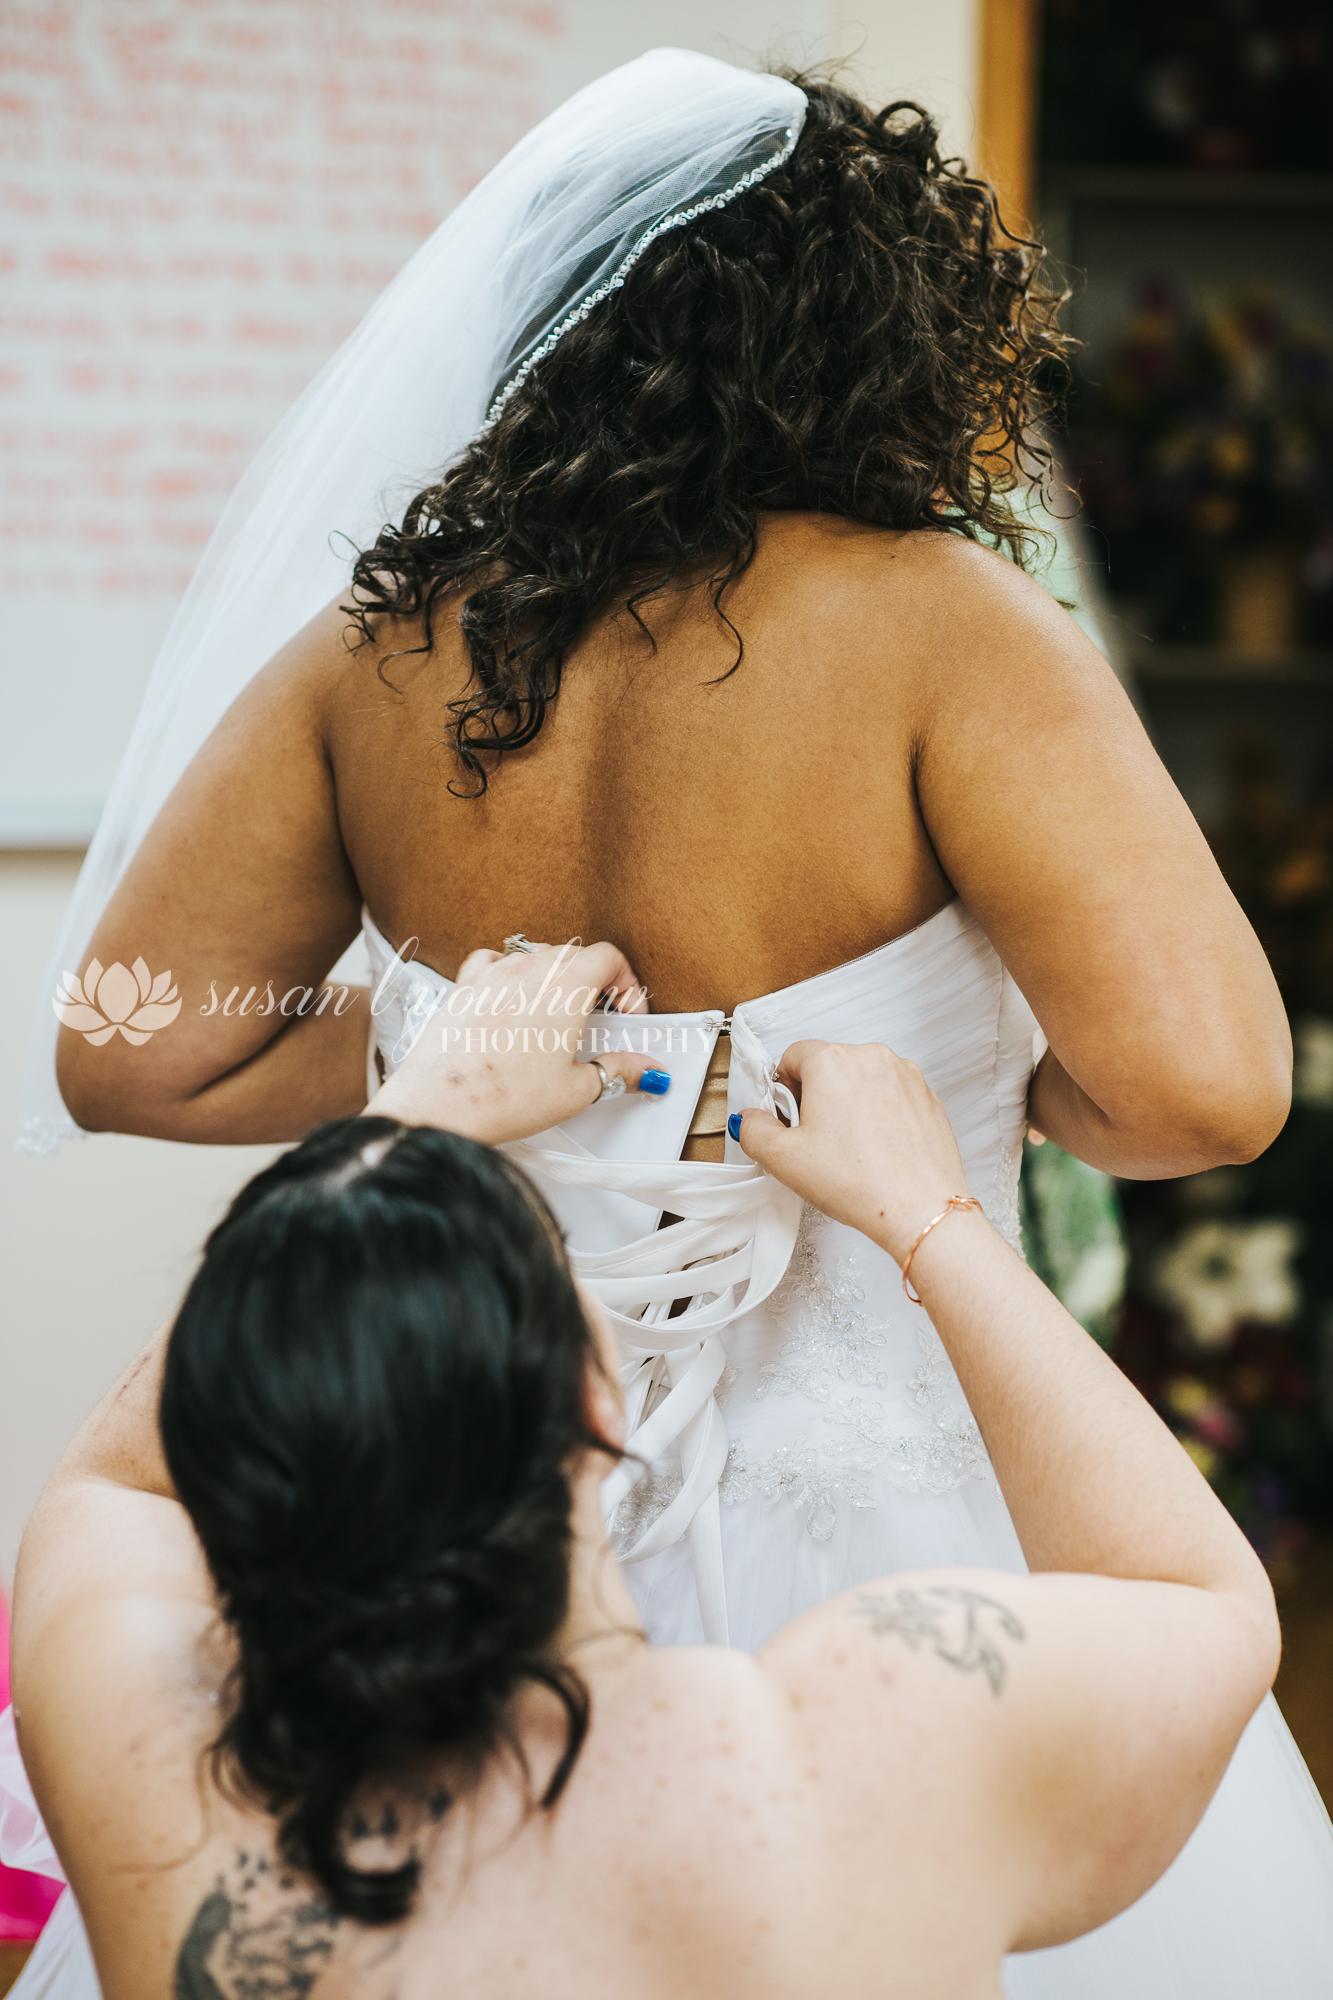 Katelyn and Wes Wedding Photos 07-13-2019 SLY Photography-7.jpg